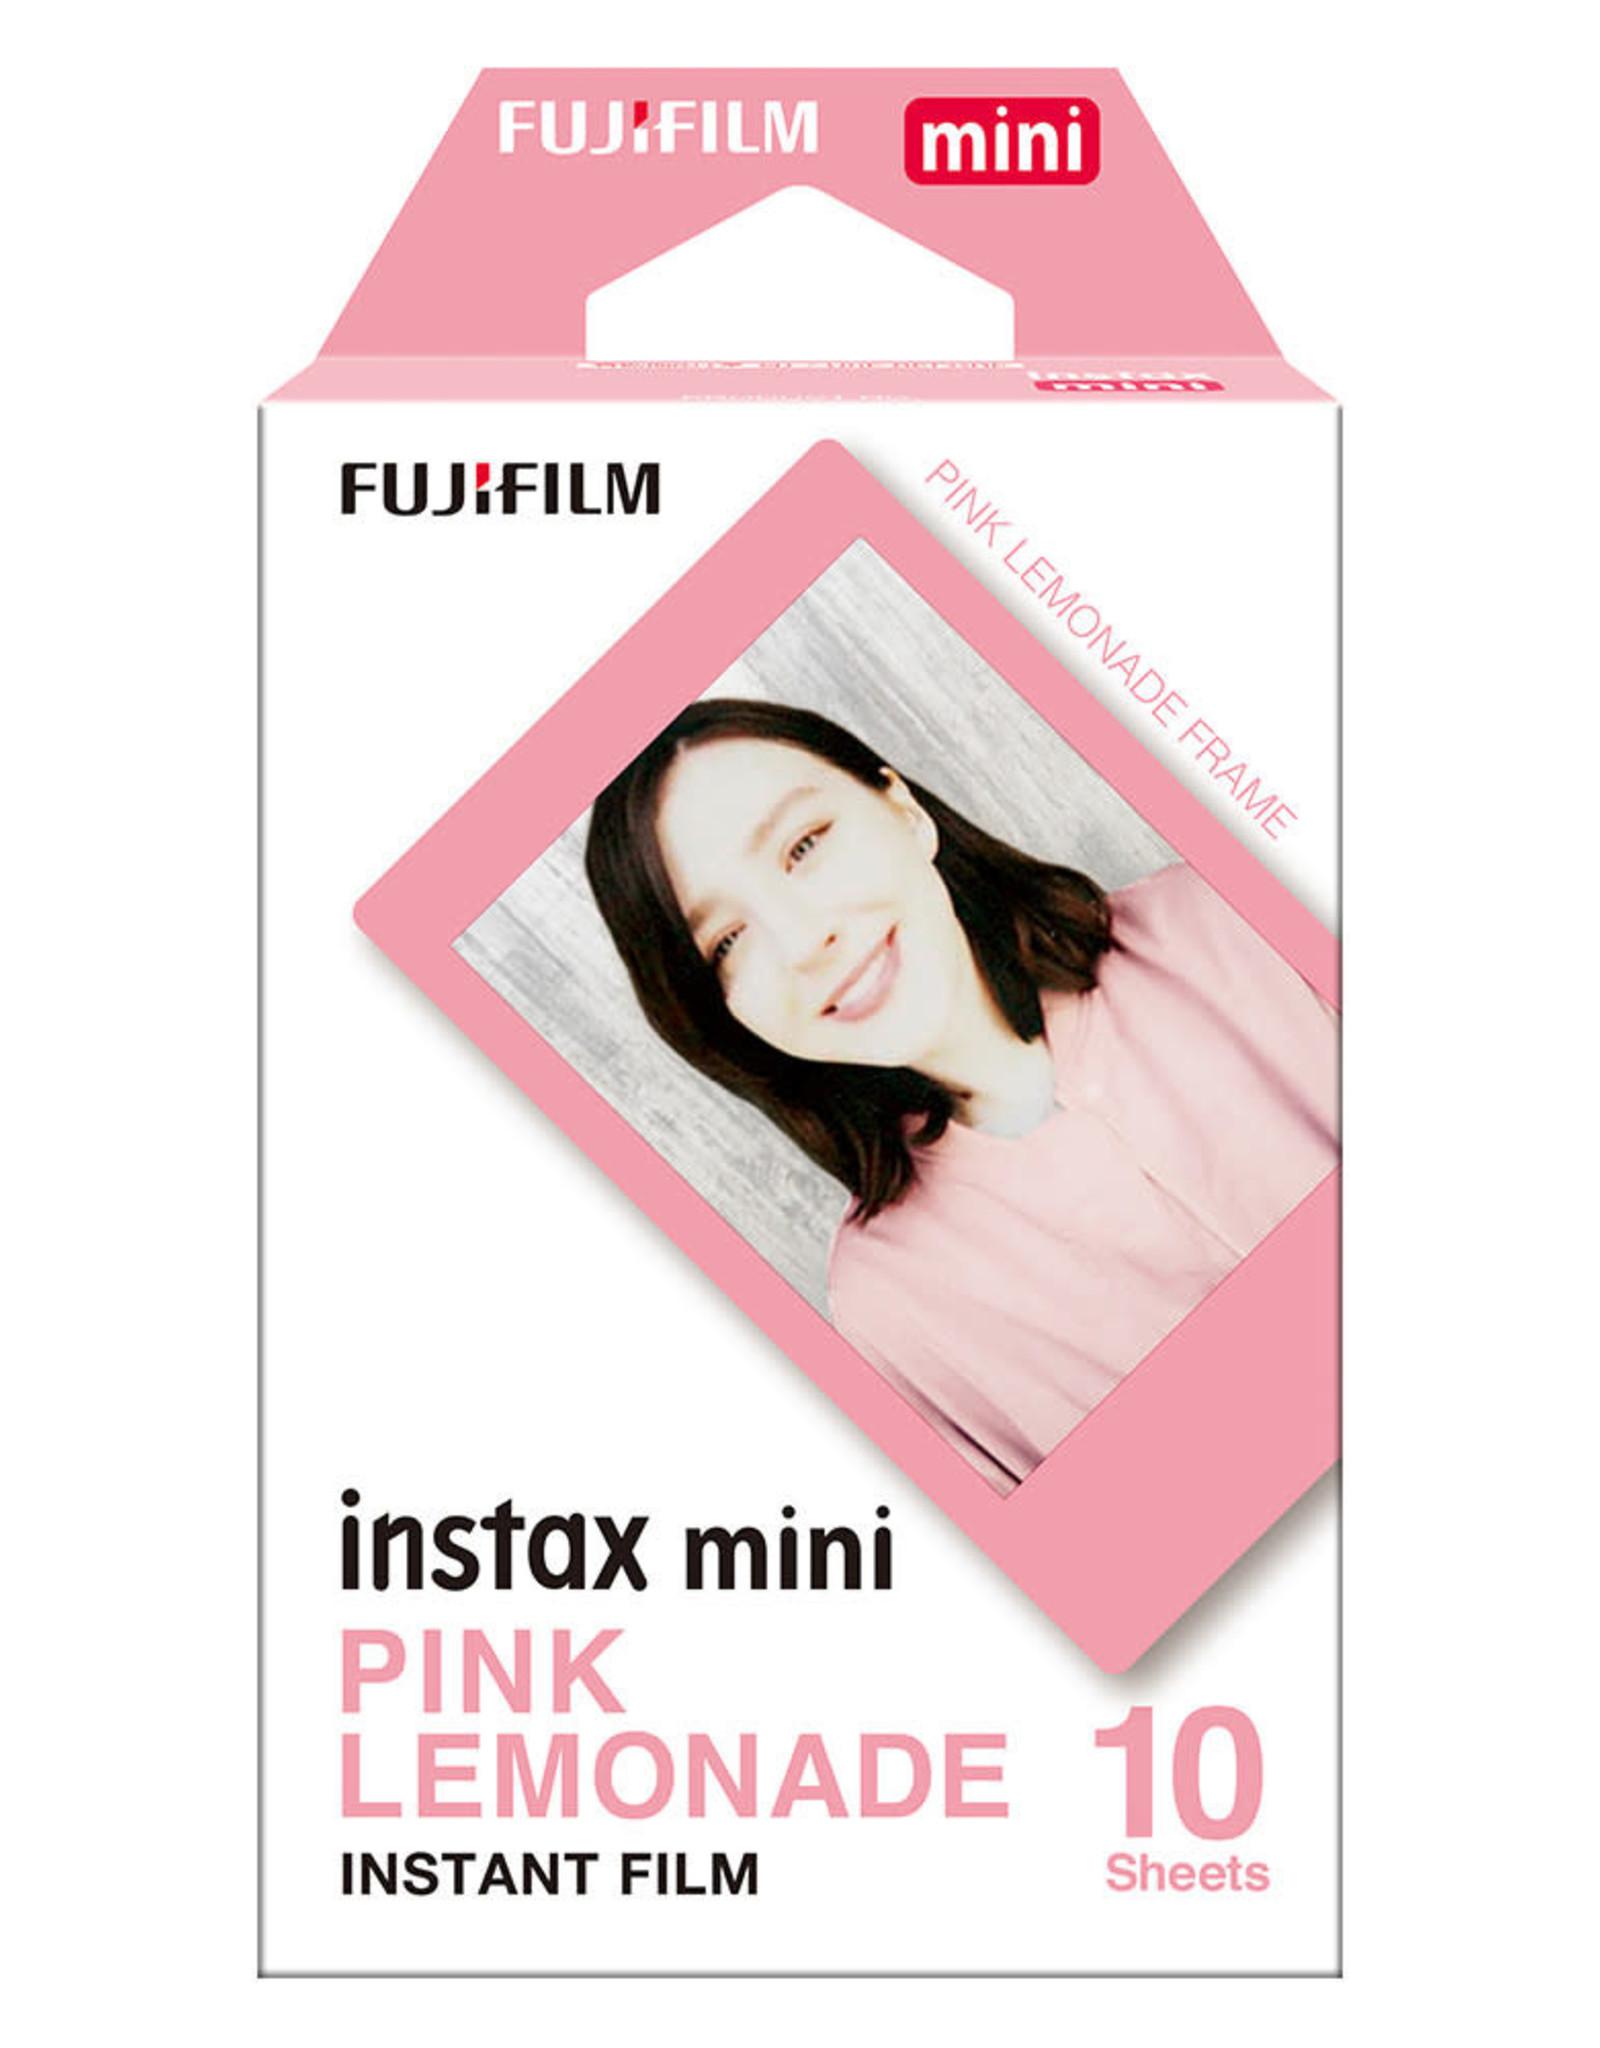 Instax Fujifilm | Instax Mini Film Pink Lemonade 10 Sheets 600019839